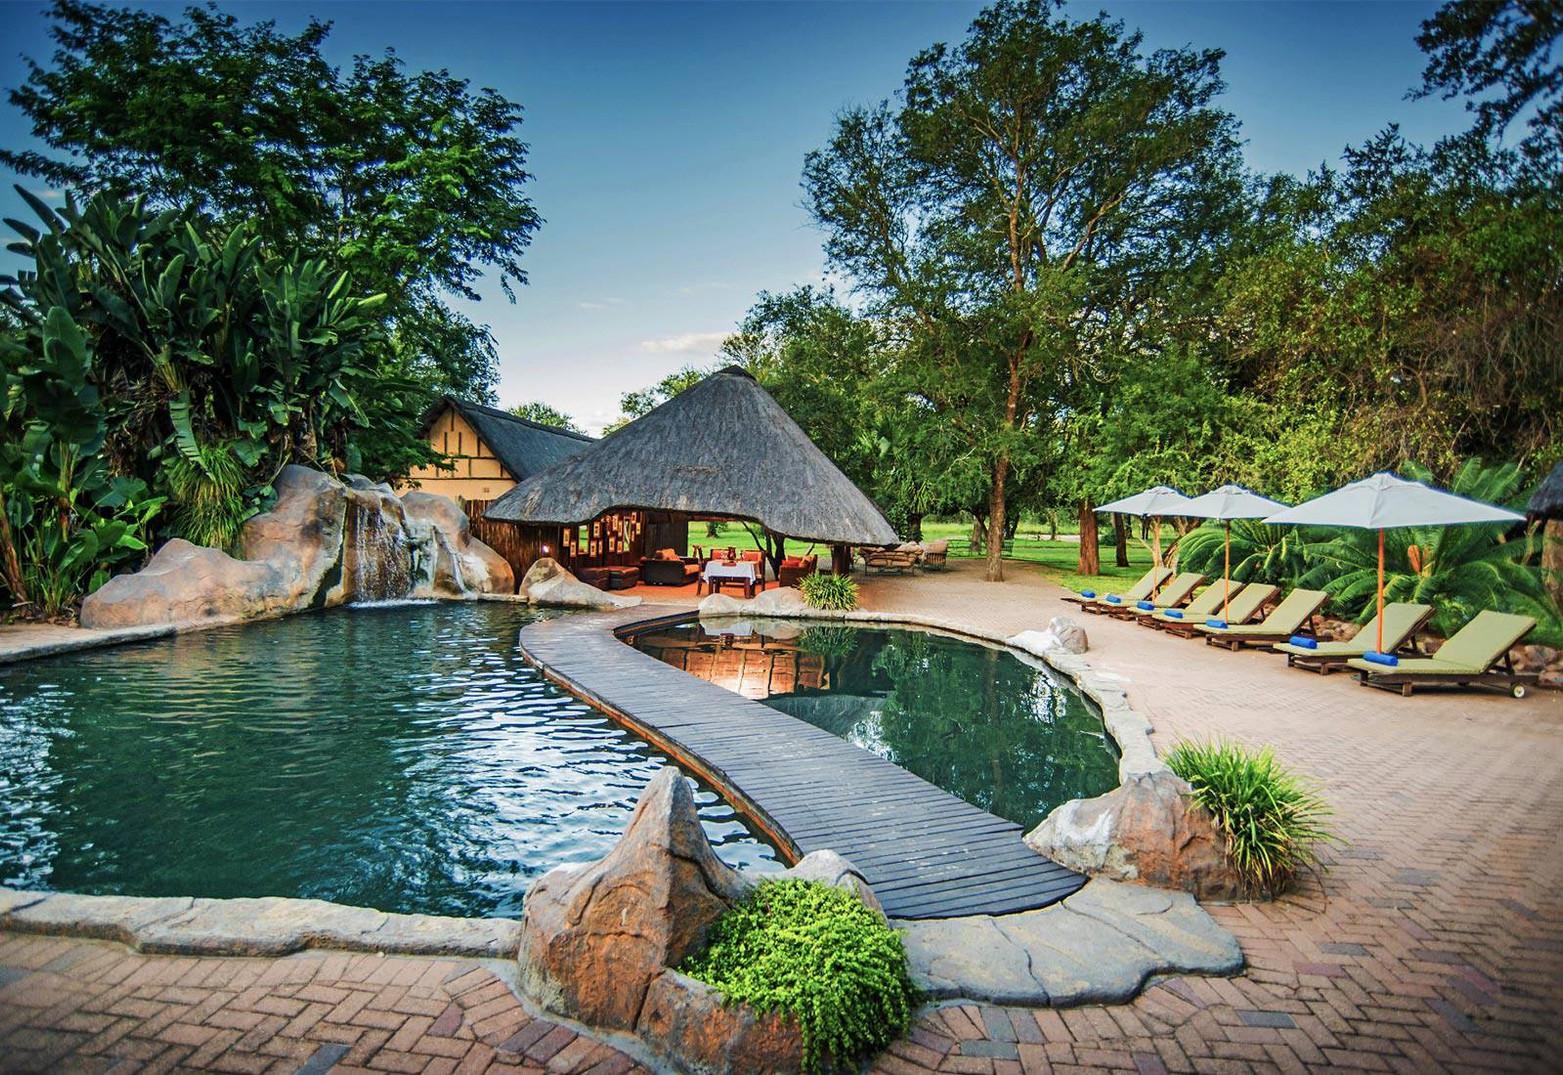 Shiduli Private Game Luxury Lodge